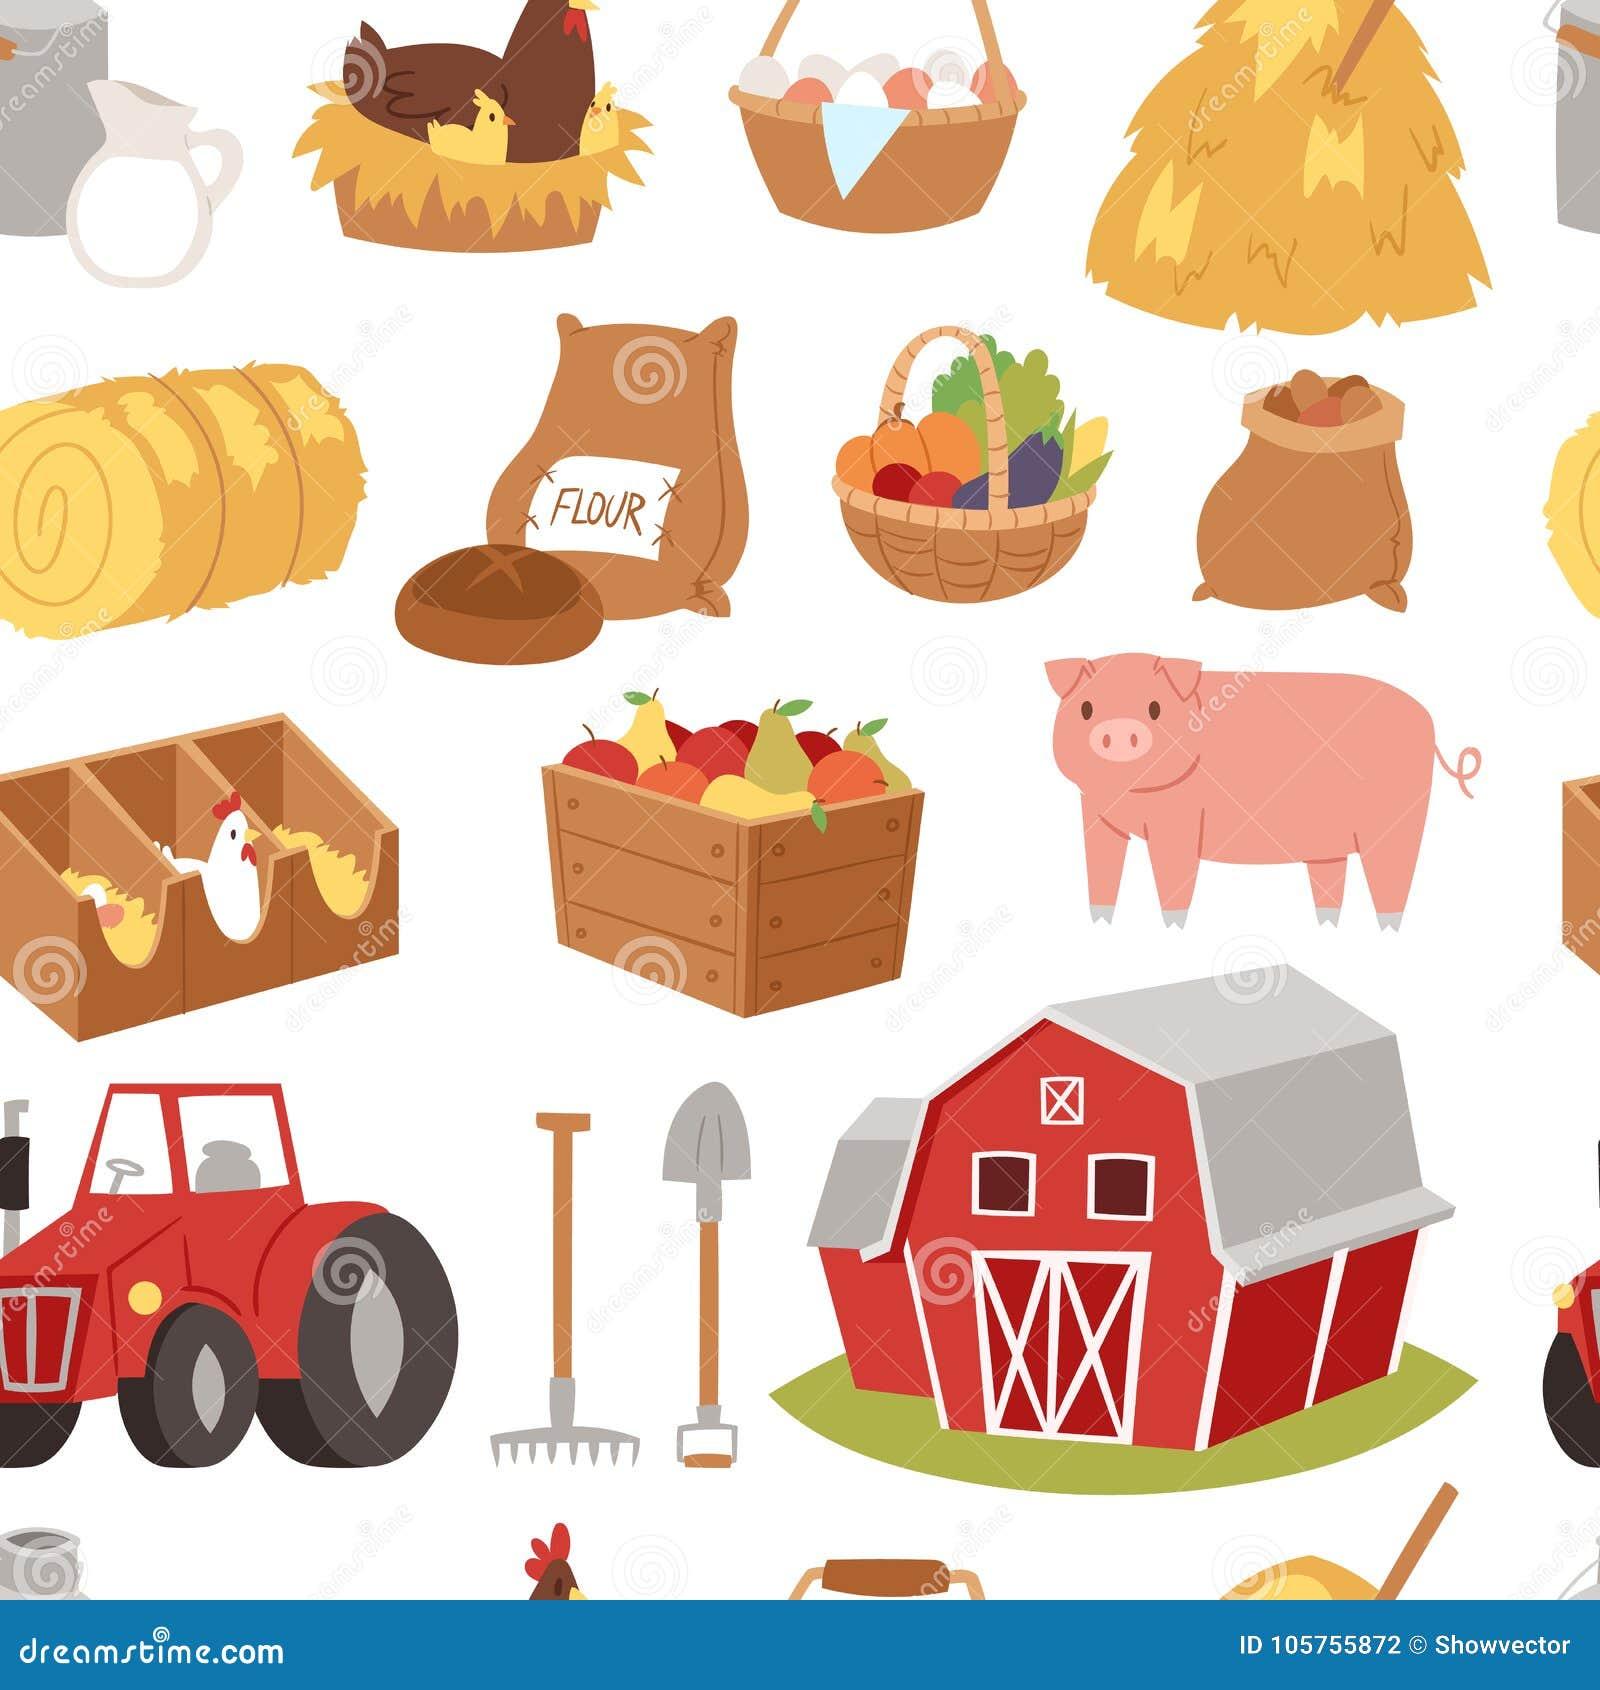 Farm Vector Tools And Symbols House Tractor Cartoon Stock Vector